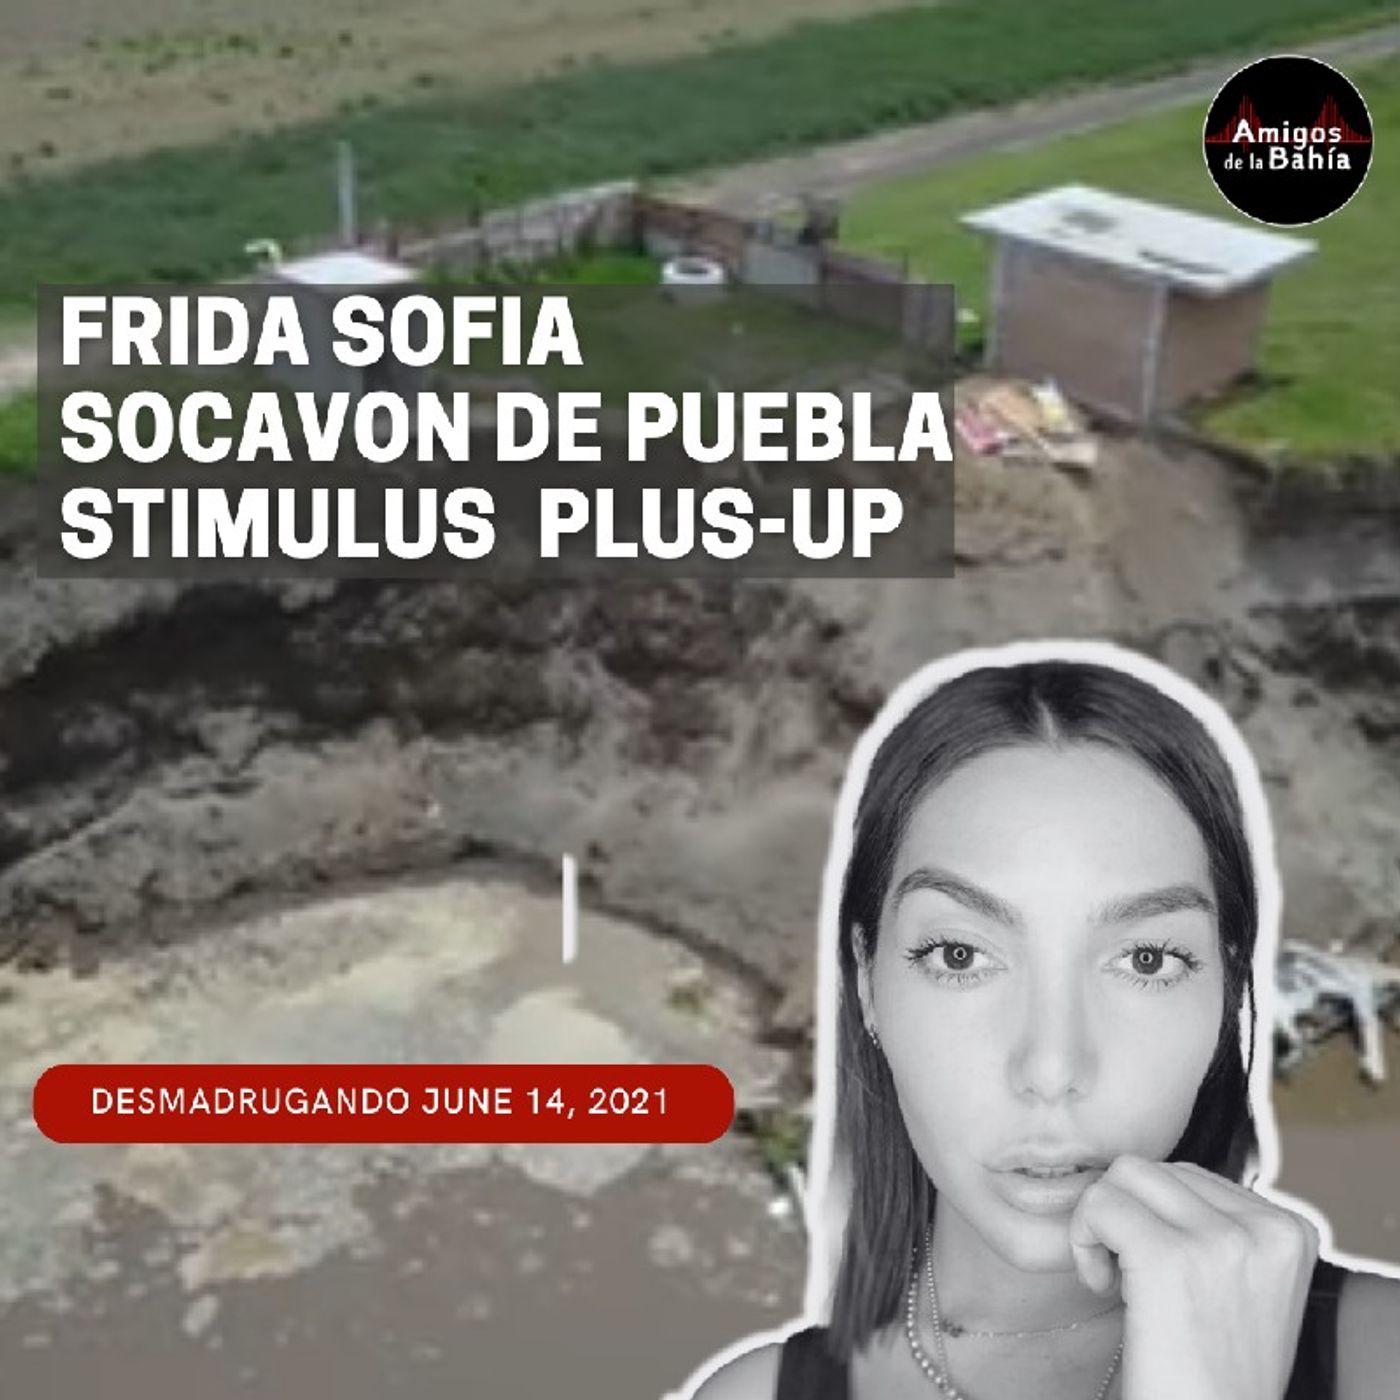 34. Frida Sofia, Socavón, Cheque de Stimulus 'plus-up'   DESMADRUGANDO Jun 14, 2021